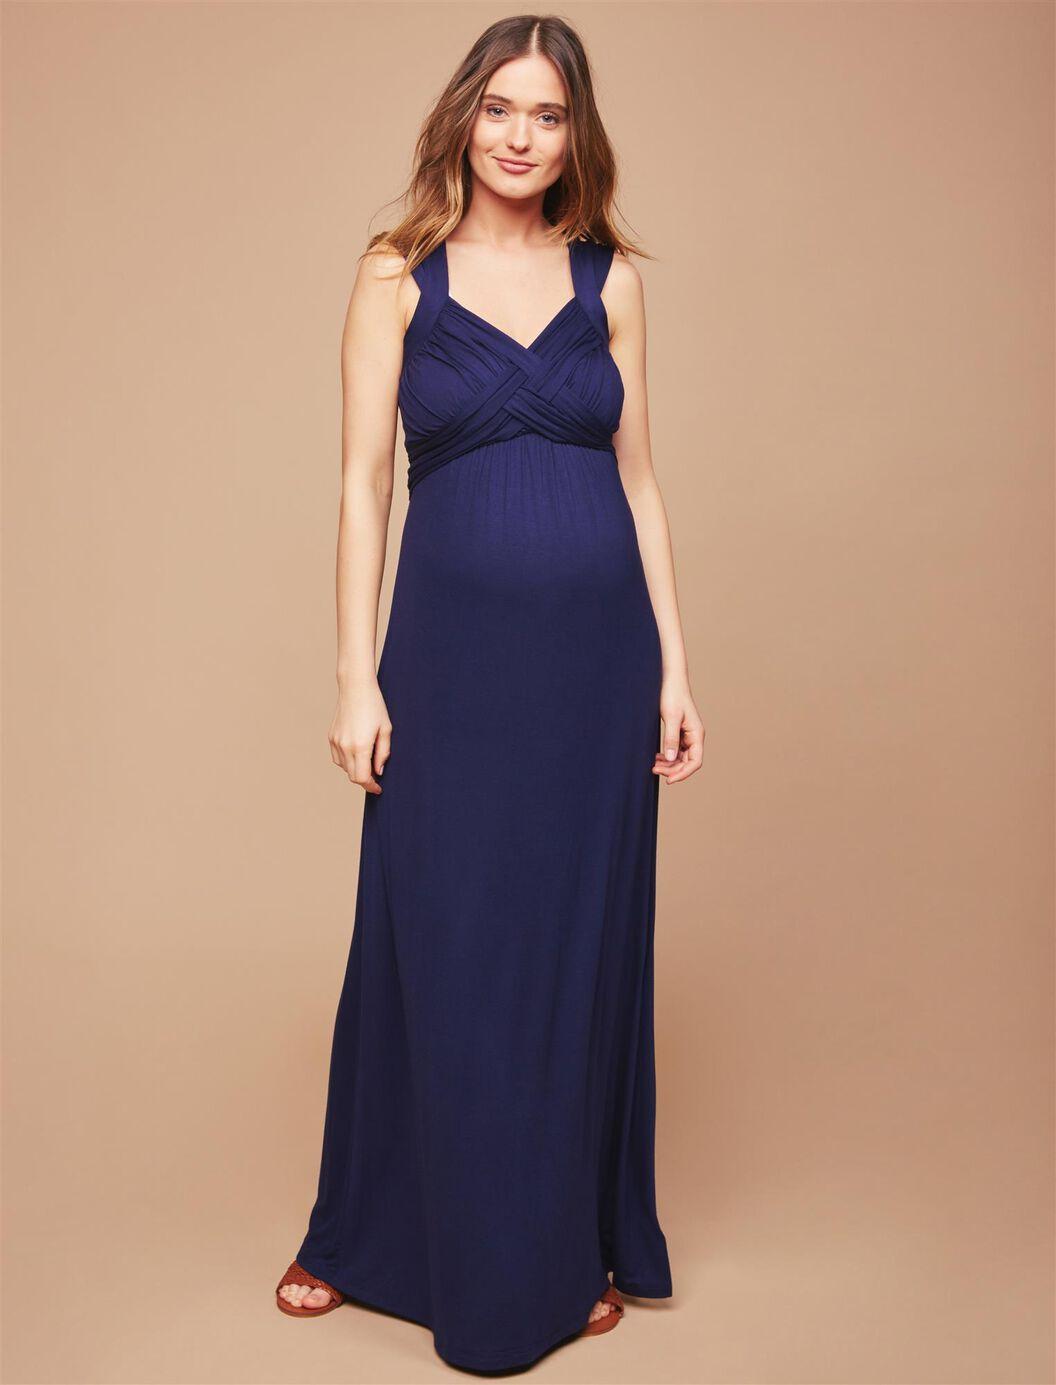 Cross Back Maternity Maxi Dress at Motherhood Maternity in Victor, NY | Tuggl